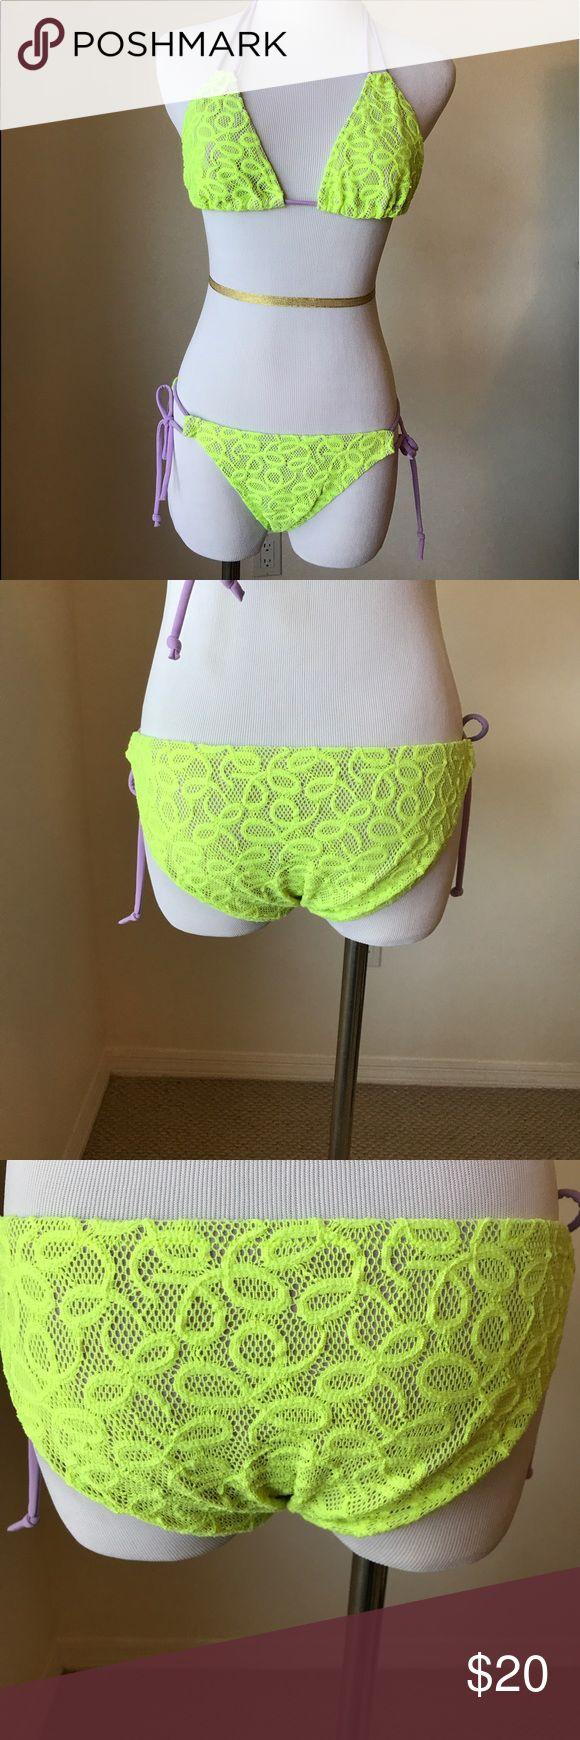 25+ best ideas about Neon bikinis on Pinterest | Red ...